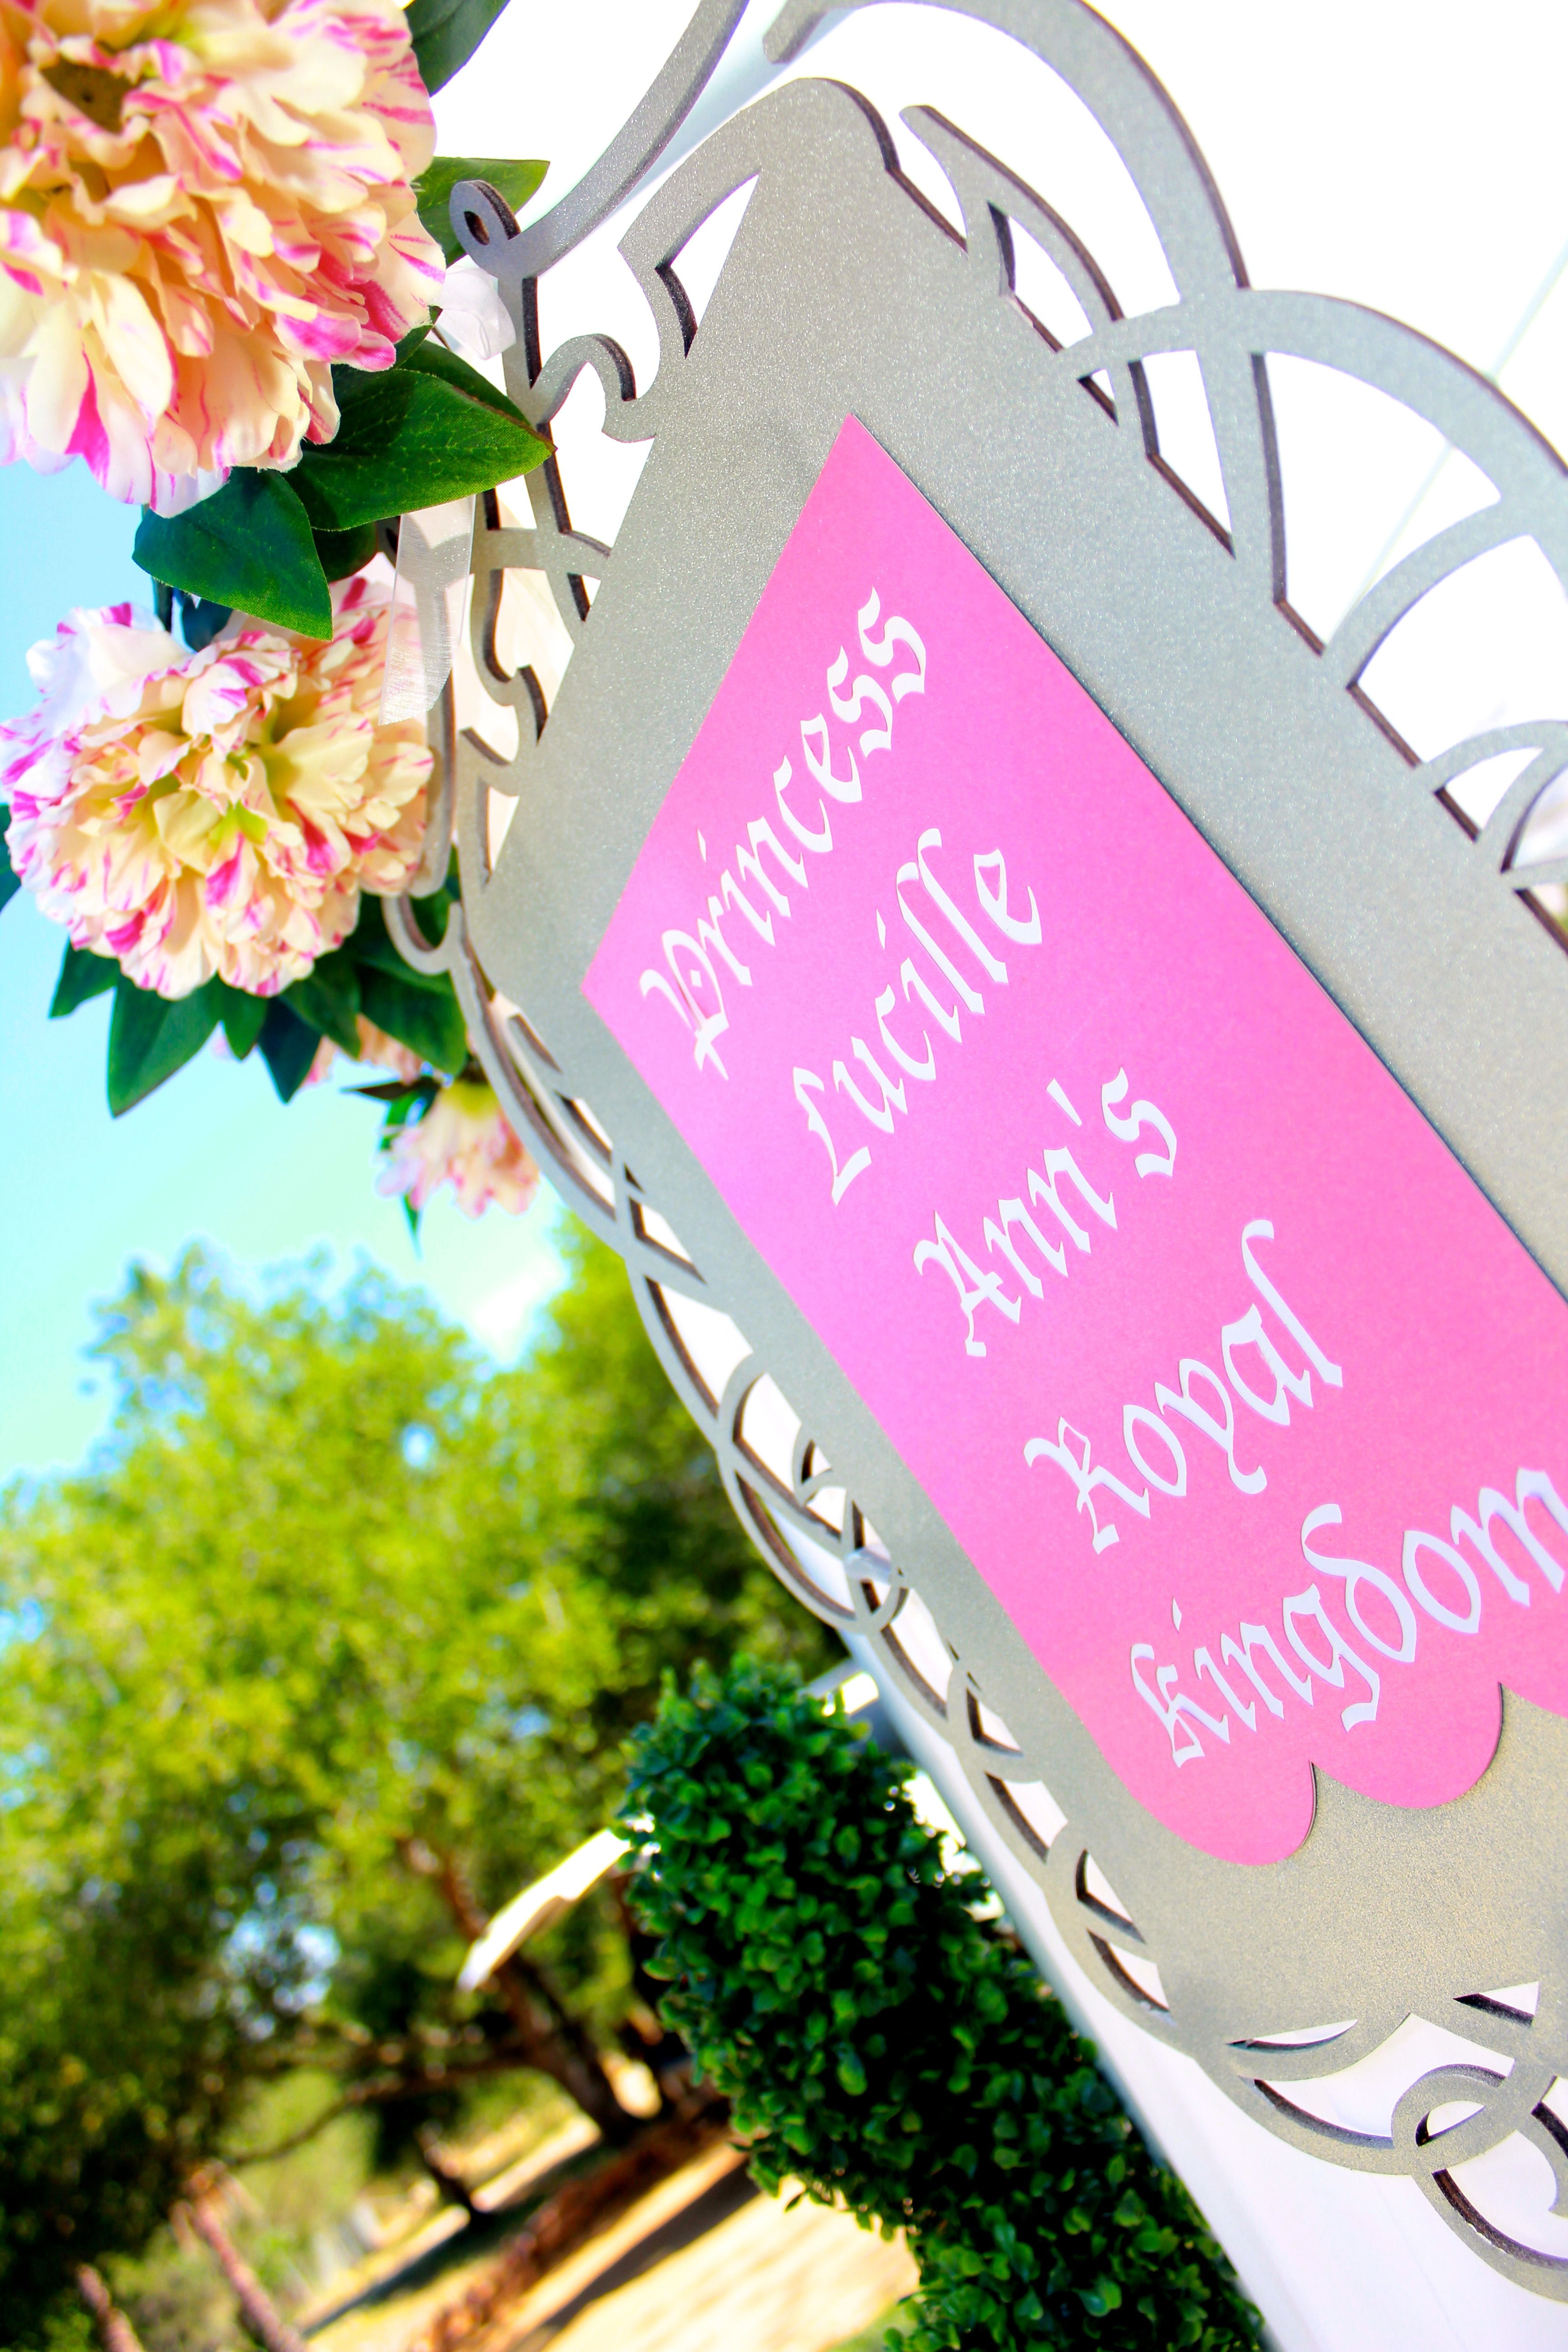 Princess Party Signage